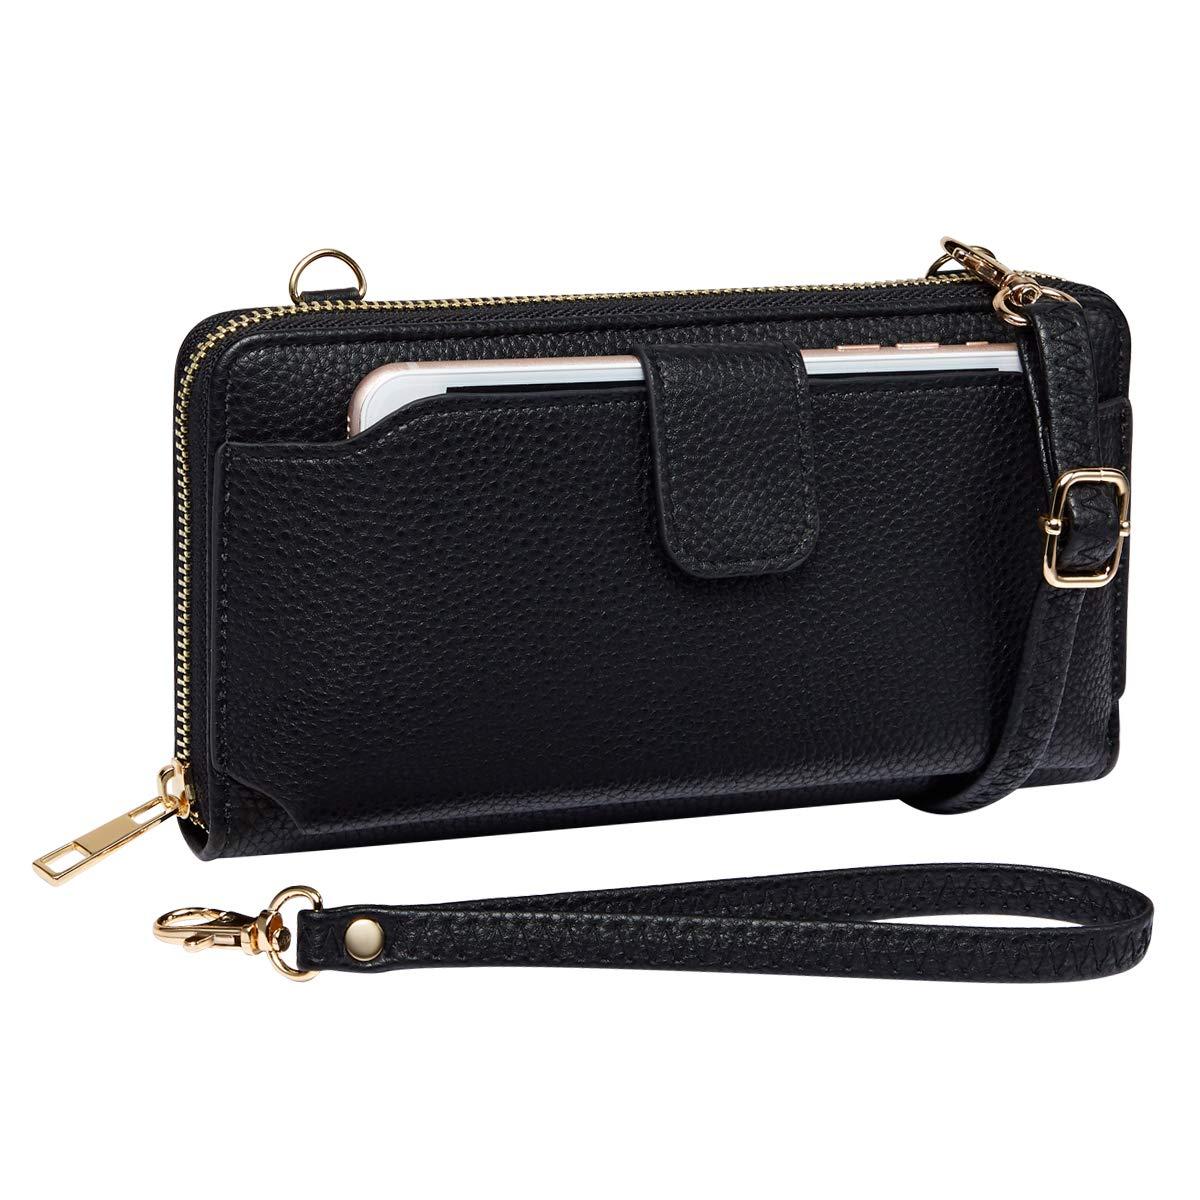 K A Women Purse Wallet RFID Blocking Credit Card Phone Case Wristlet Handbags (Black) by K . A